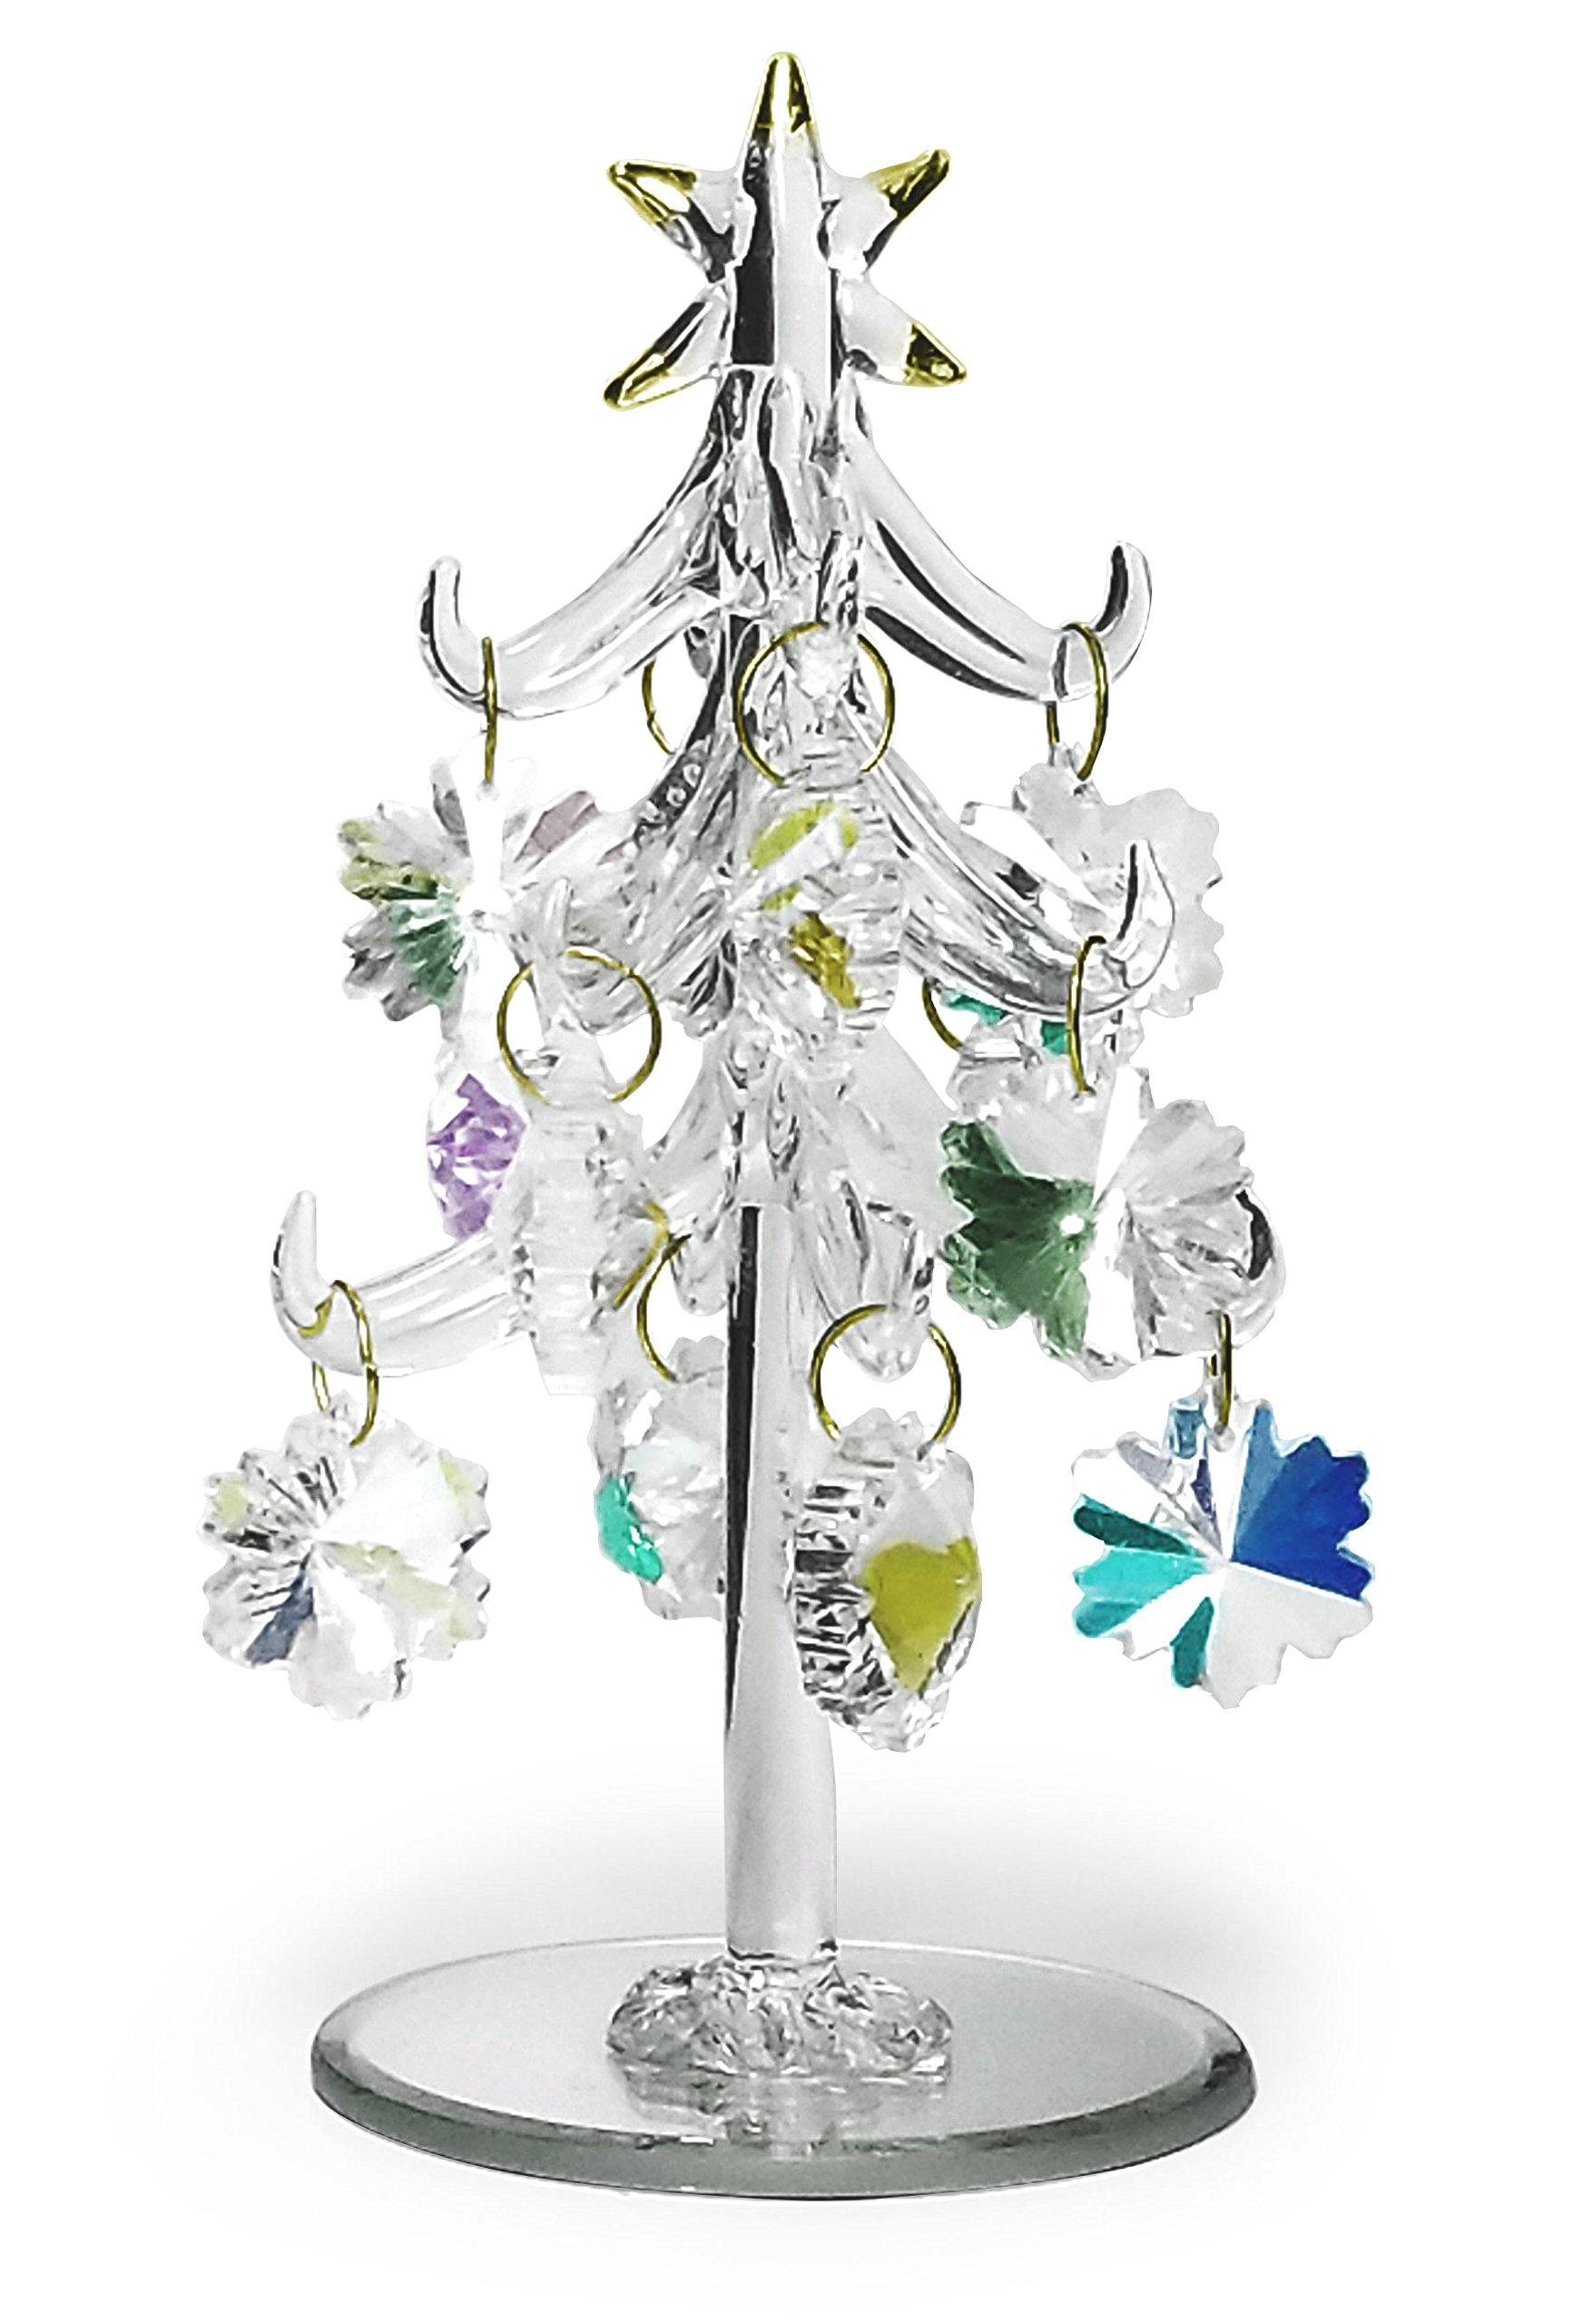 Glass Christmas Tree - Iridescent Glass Christmas Tree with Gold Trim - 12 Removable Snowflake Ornaments - 6'' Tall Tabletop Christmas Tree Decoration